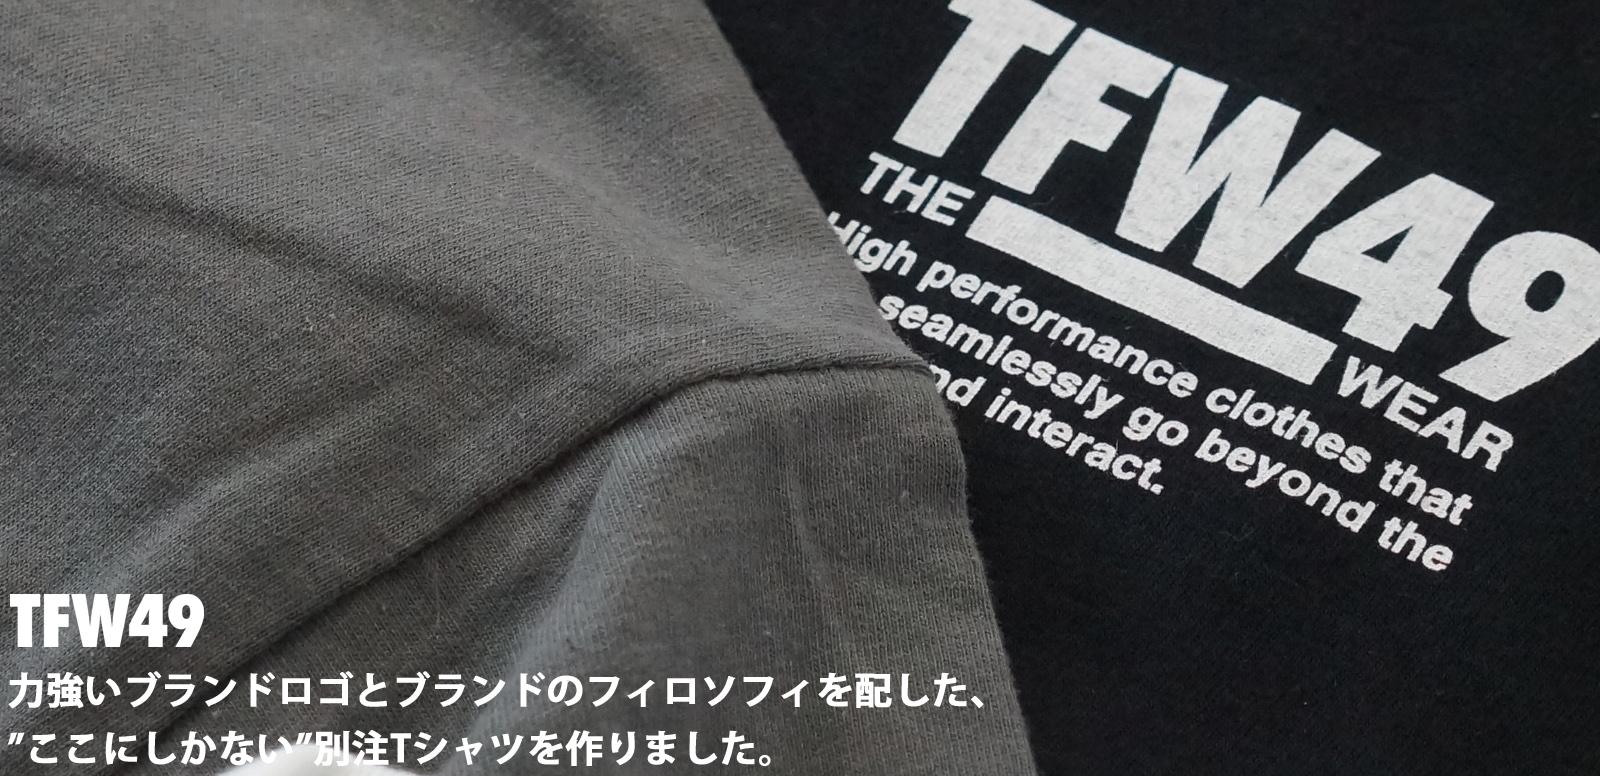 pc_topbanner12.jpg